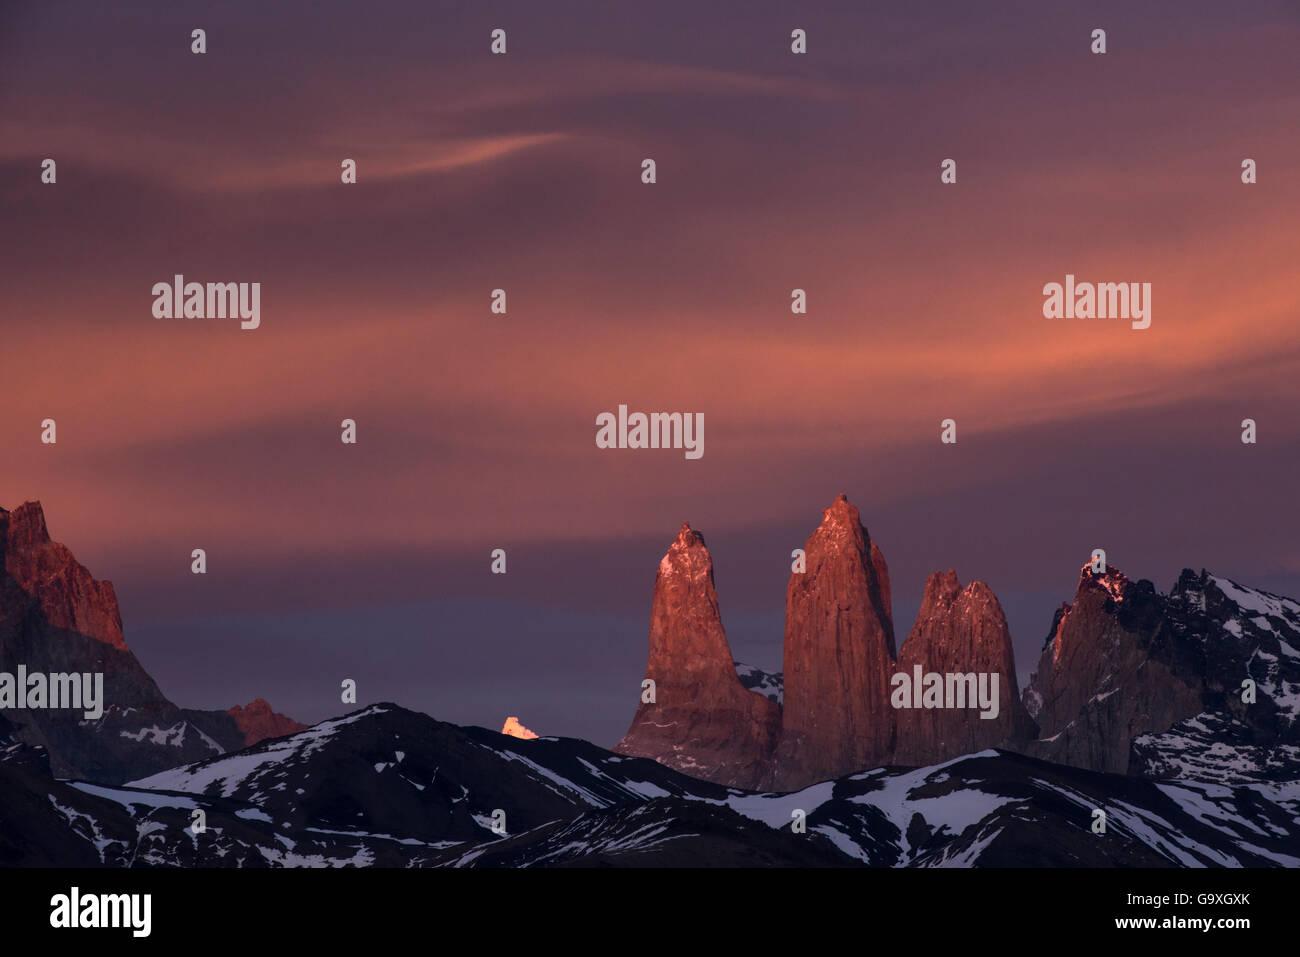 Three granite peaks of Paine mountain range, Torres del Paine National Park, Patagonia, Chile. - Stock Image